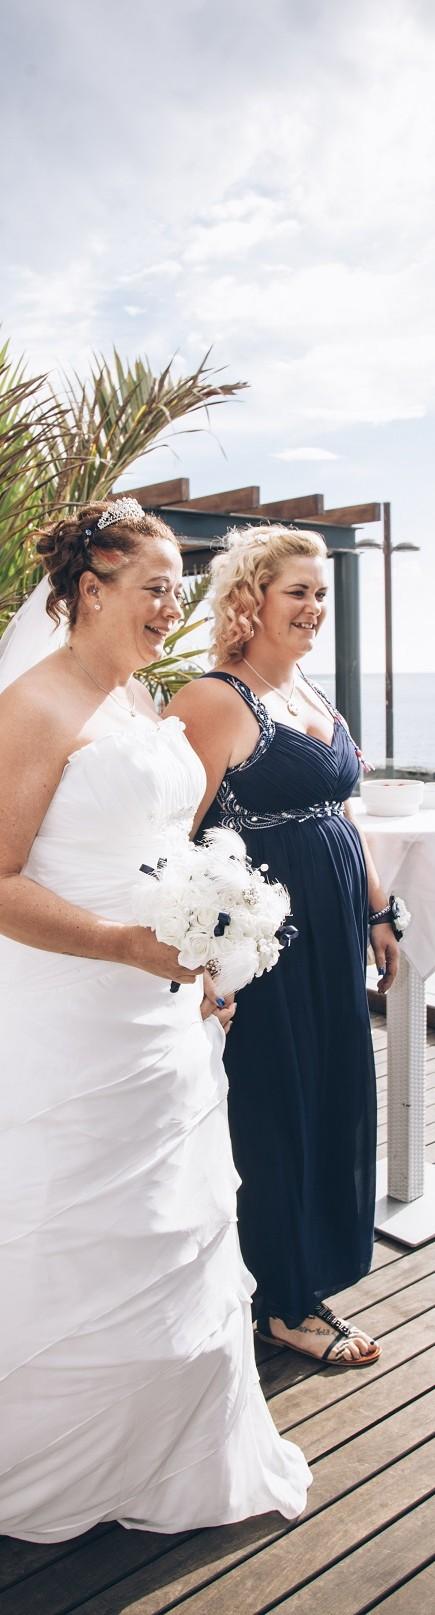 Wedding-Rachel-and-Paul-in-tenerife-myperfectwedding0062